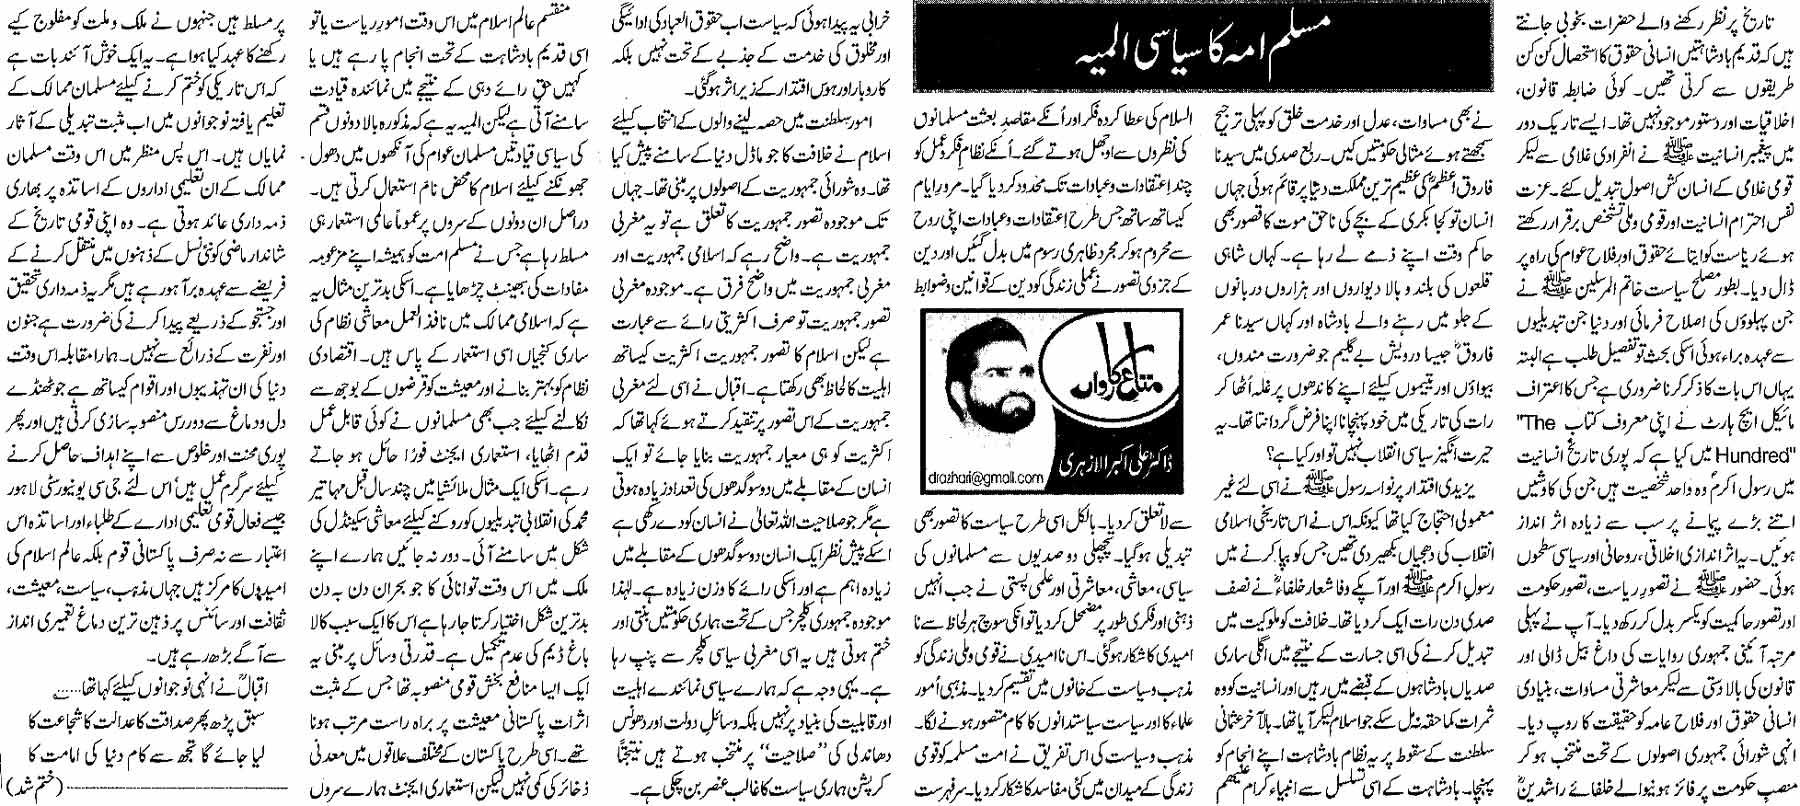 تحریک منہاج القرآن Minhaj-ul-Quran  Print Media Coverage پرنٹ میڈیا کوریج Daily-Nawa-i-Waqt